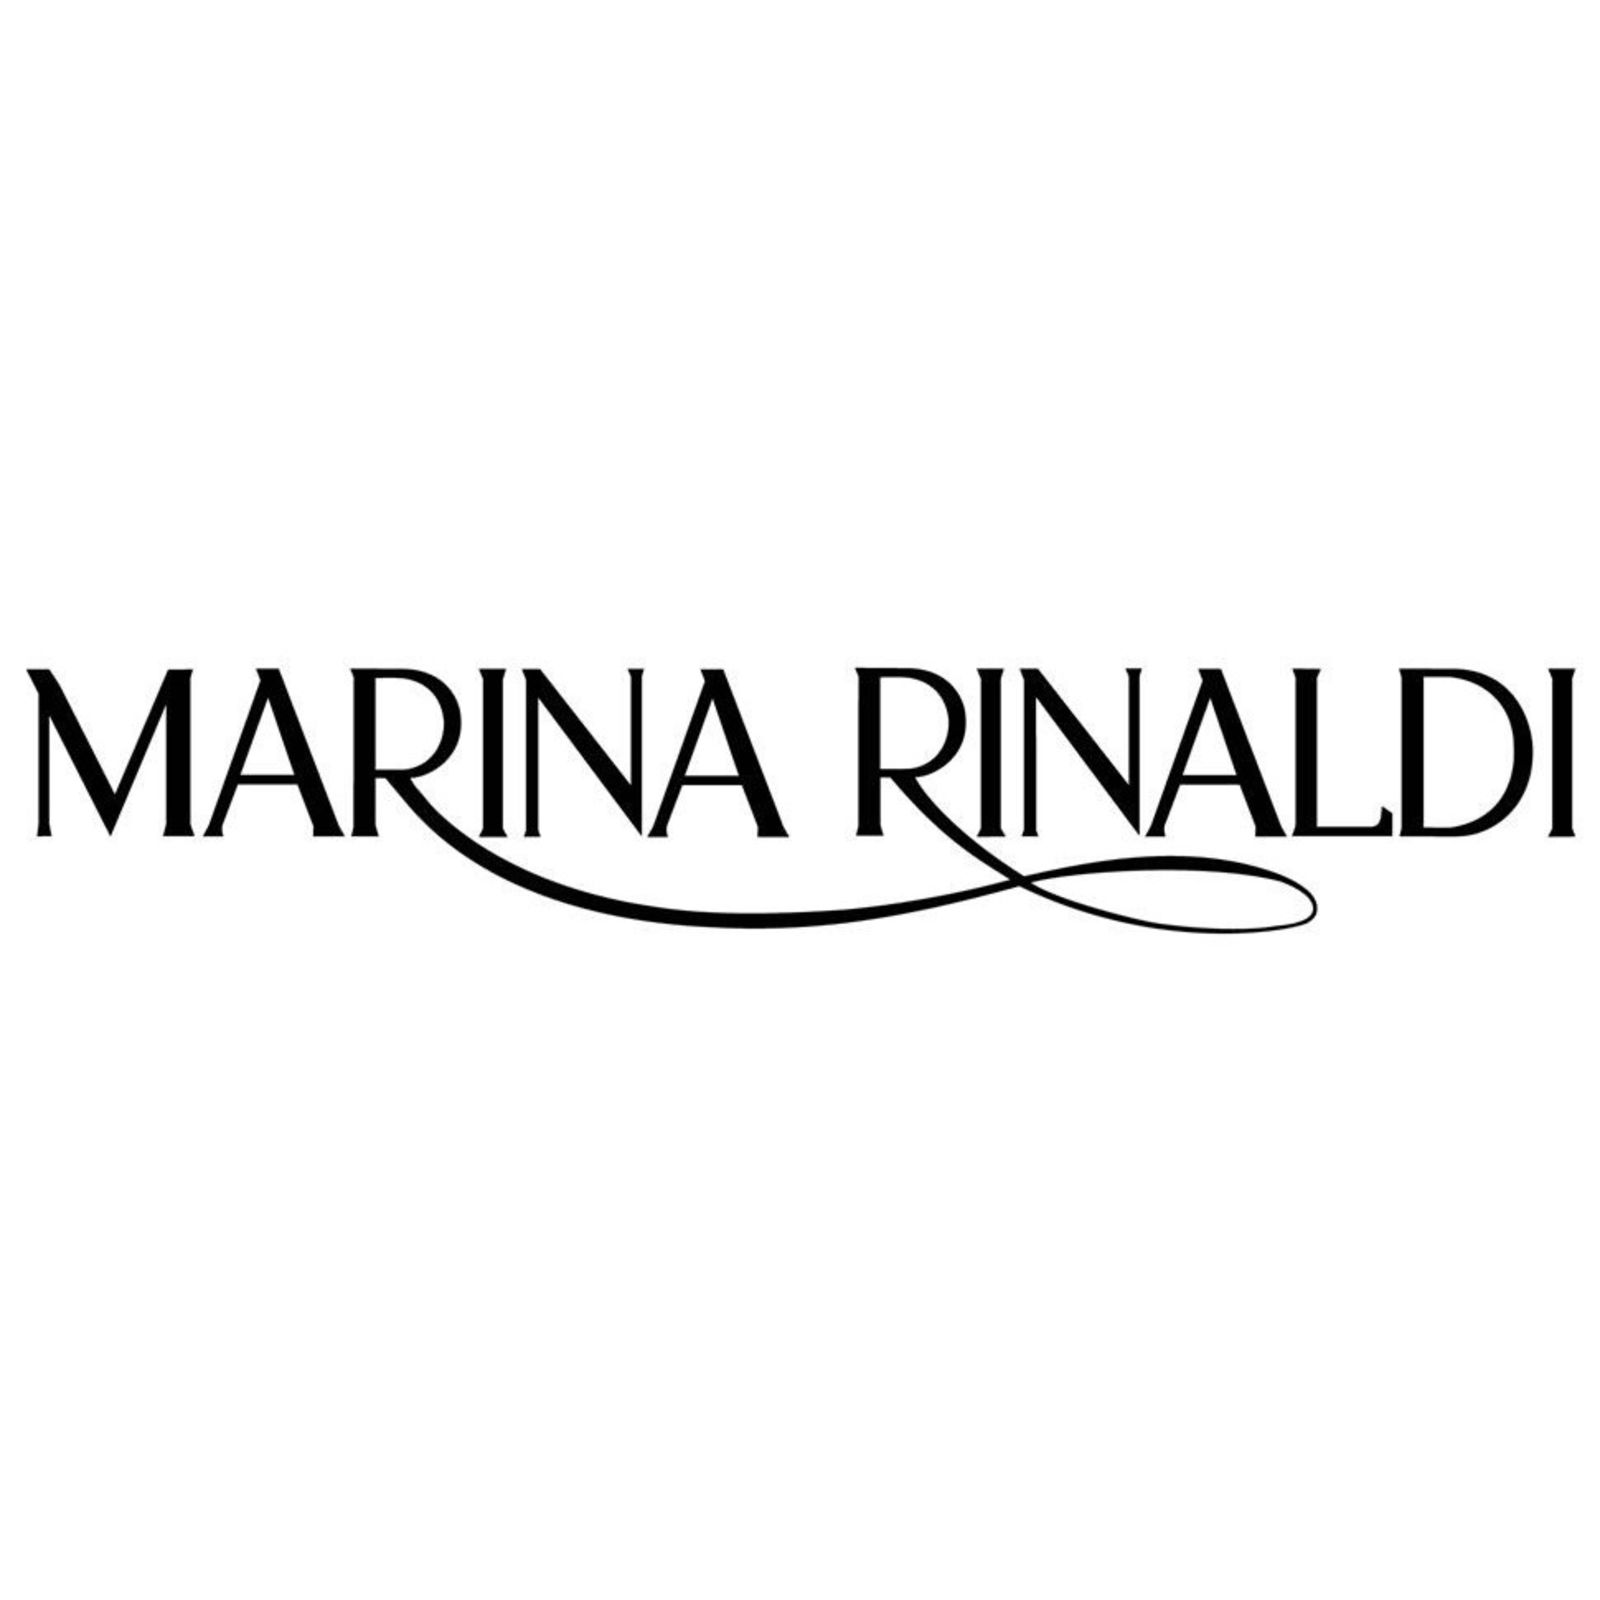 MARINA RINALDI (Image 1)